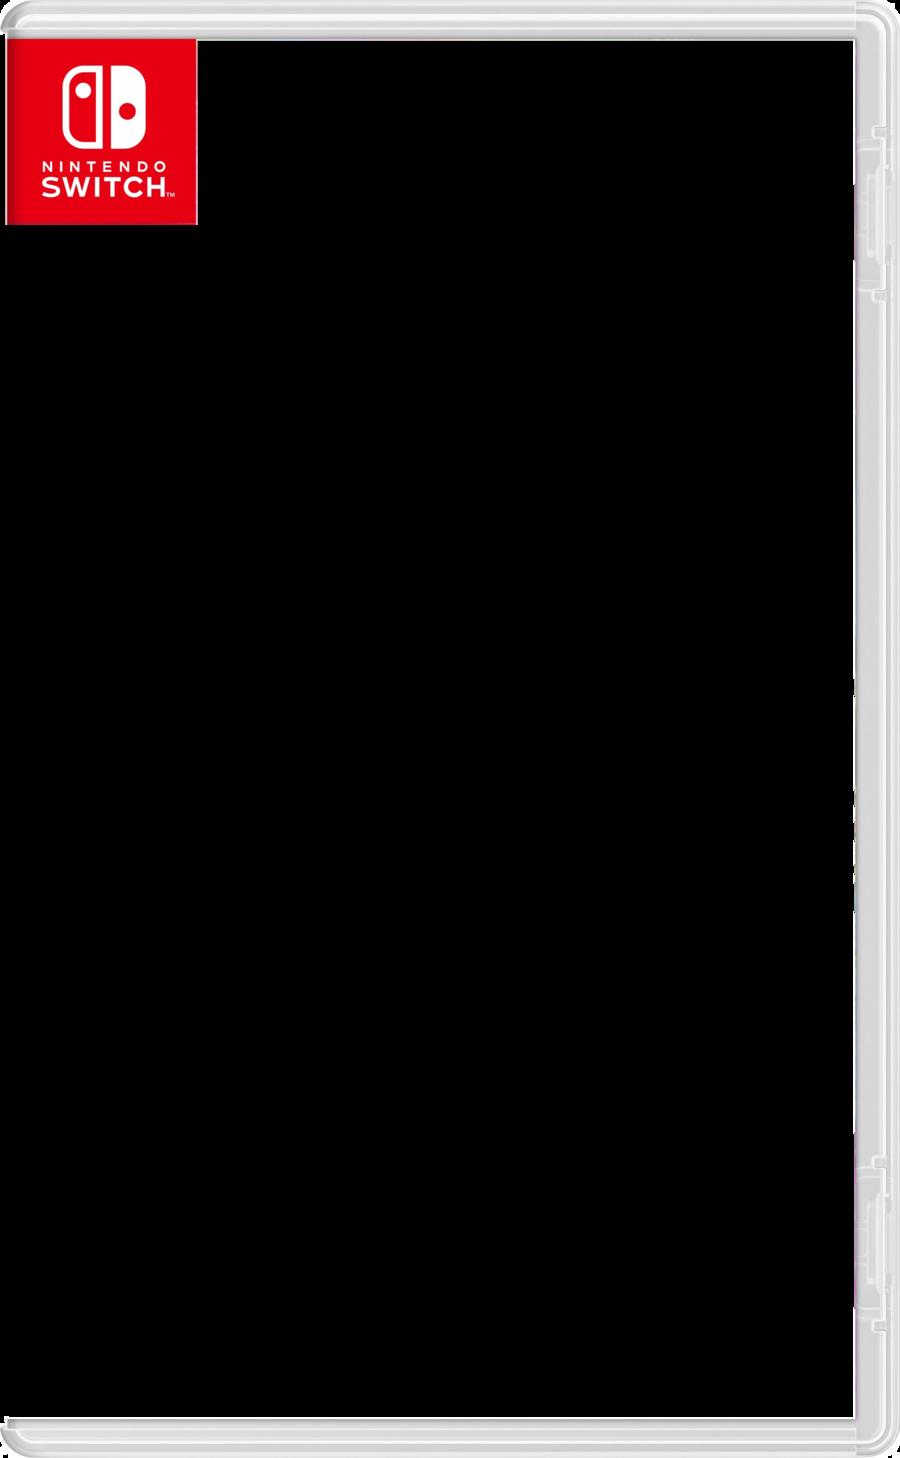 Nintendo switch box clipart svg transparent library Download HD Blank Switch Box Clipart Nintendo Switch De Blob 2 ... svg transparent library